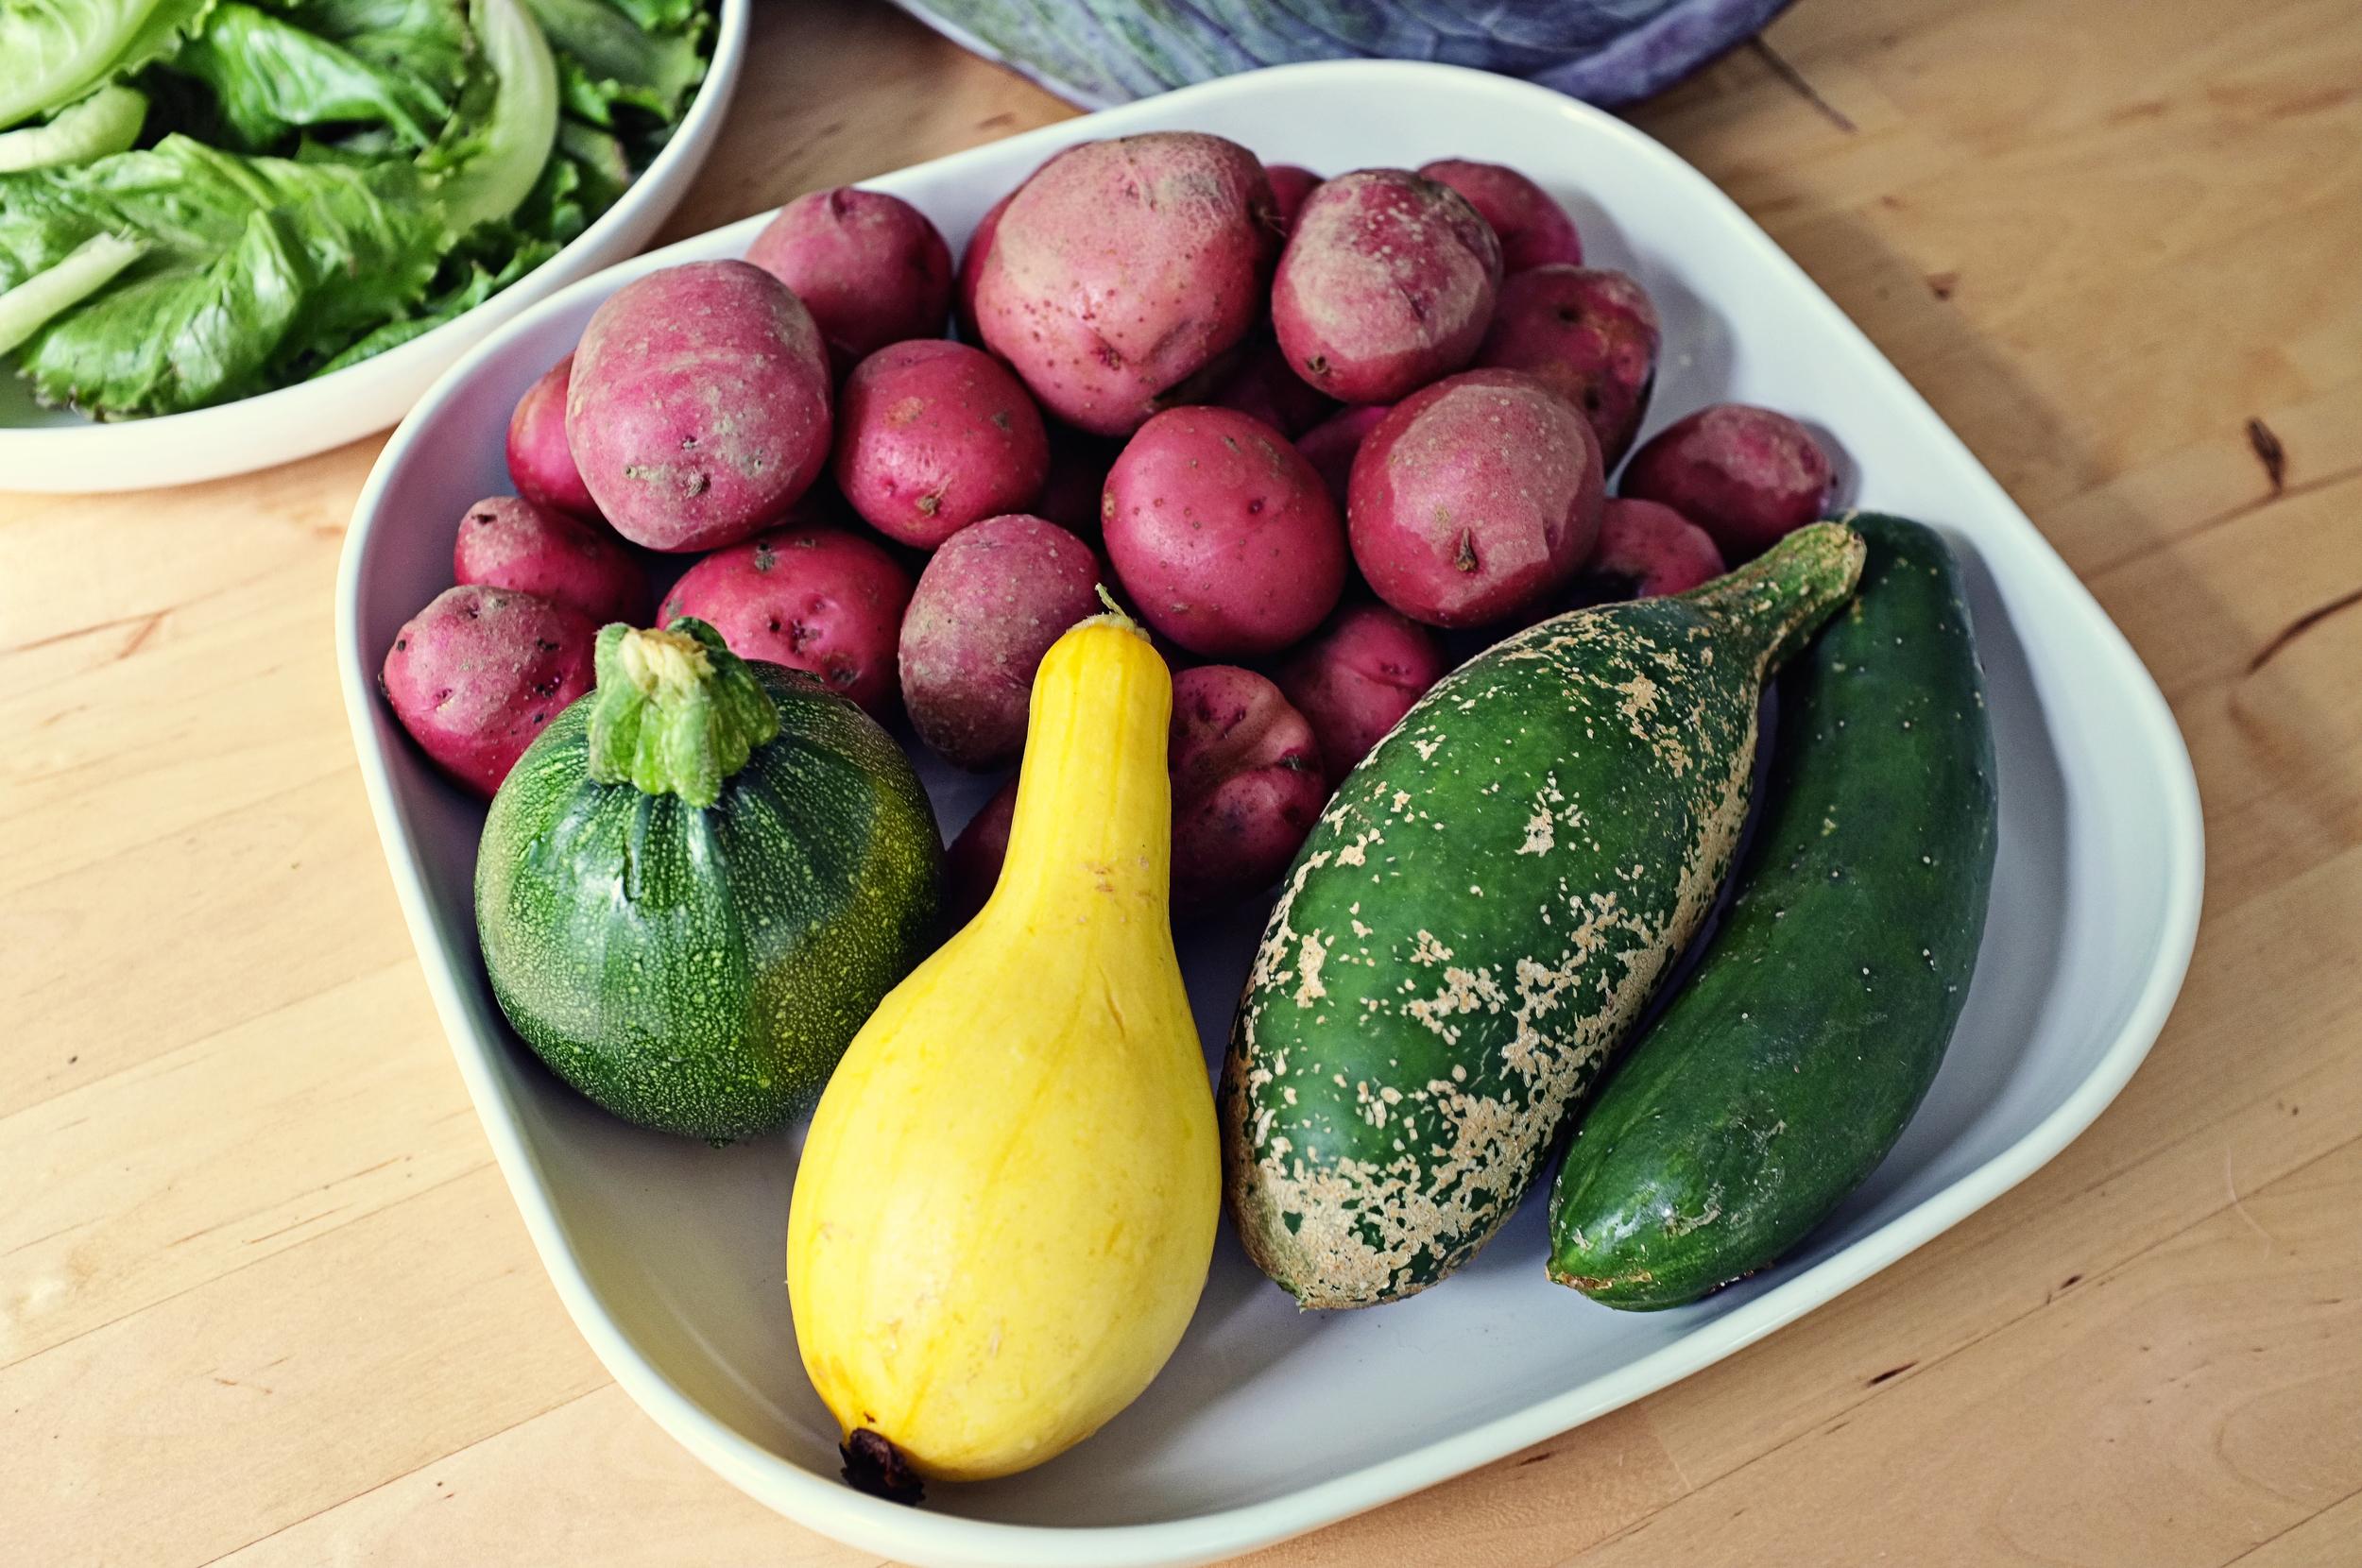 Potatoes, cukes, and squash